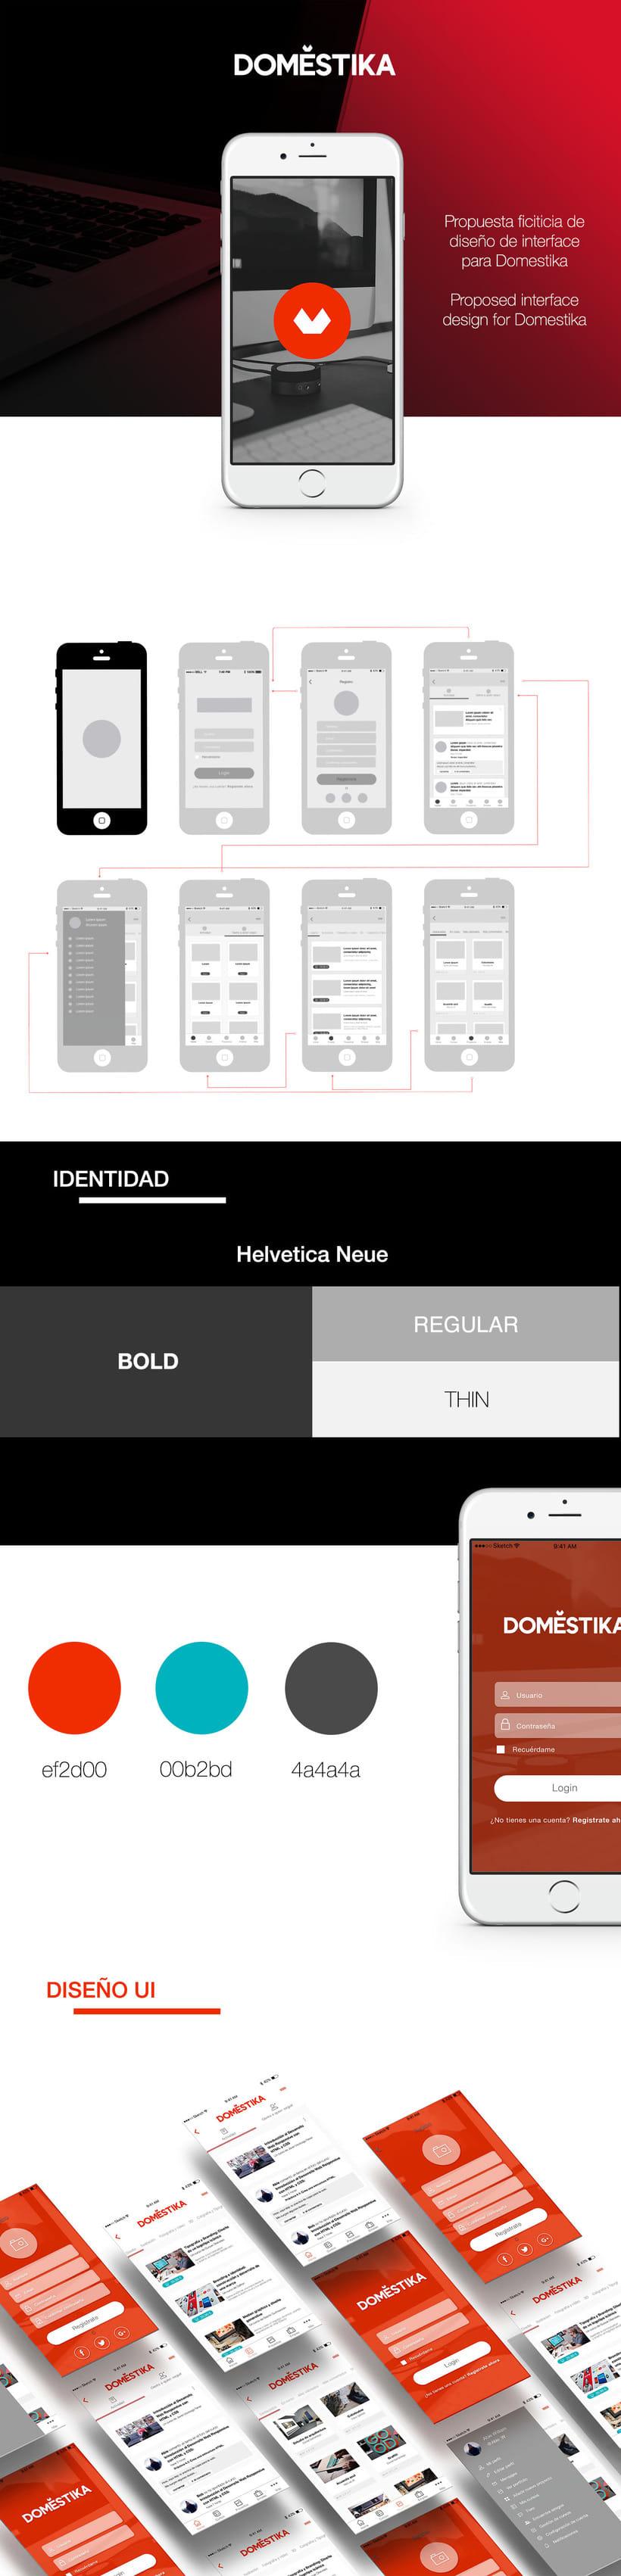 Domestika - Propuesta app mobile -1